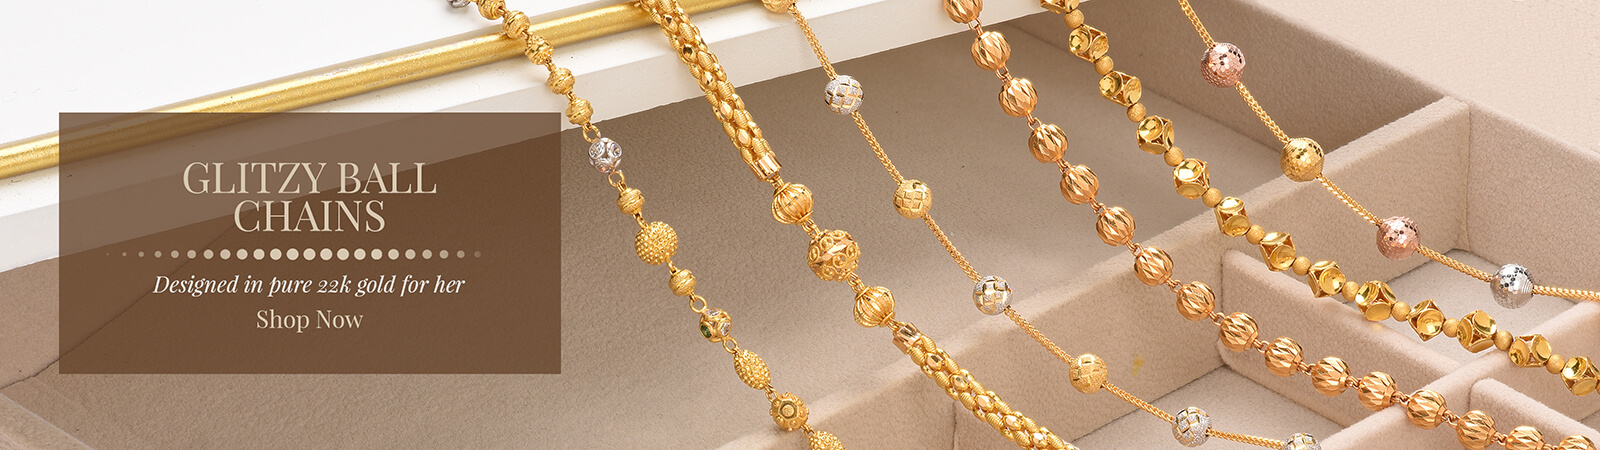 Glitzy Ball Chains